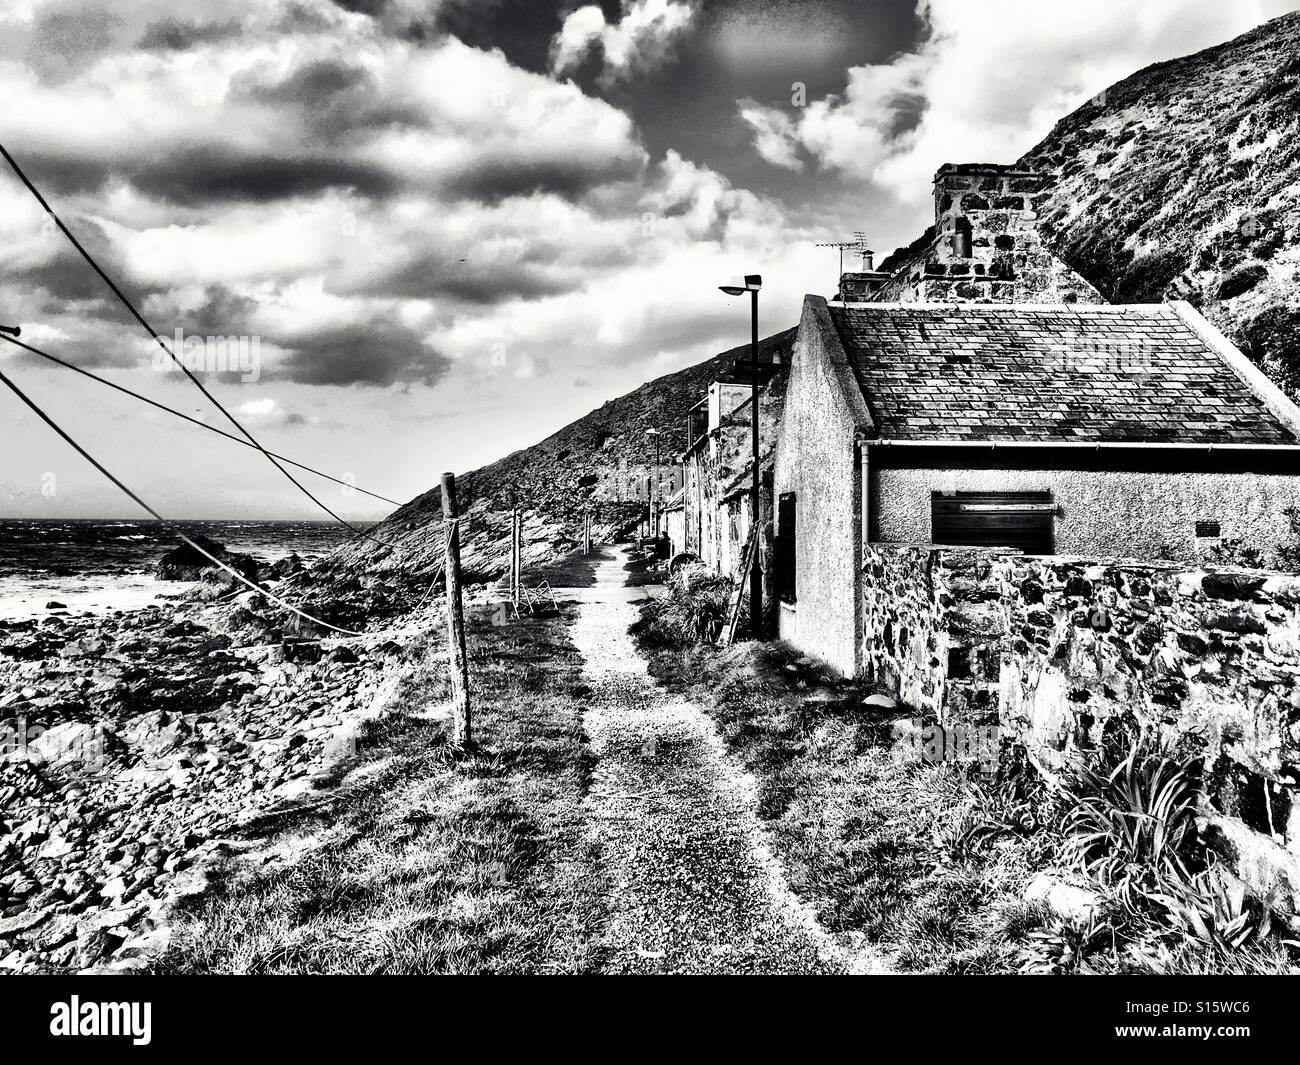 Crovie, Aberdeenshire, Grampian Region, Scotland, UK. - Stock Image